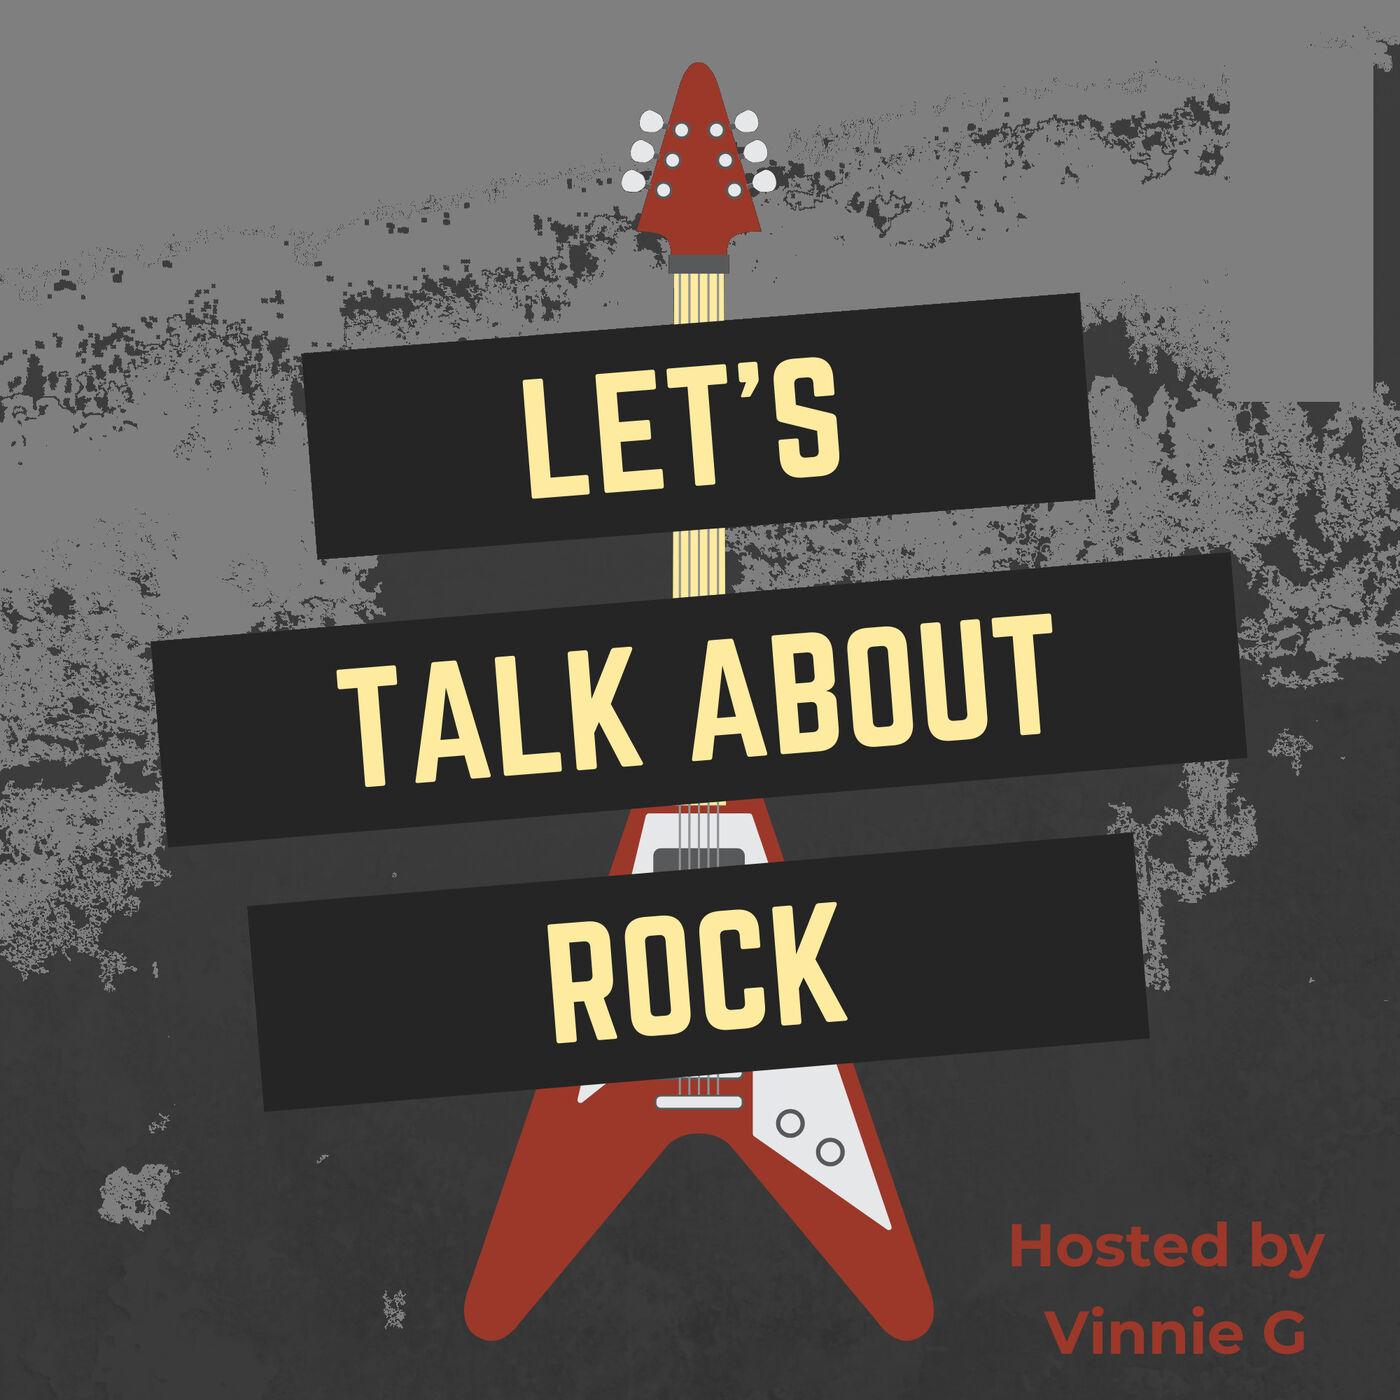 Let's Talk About Rock